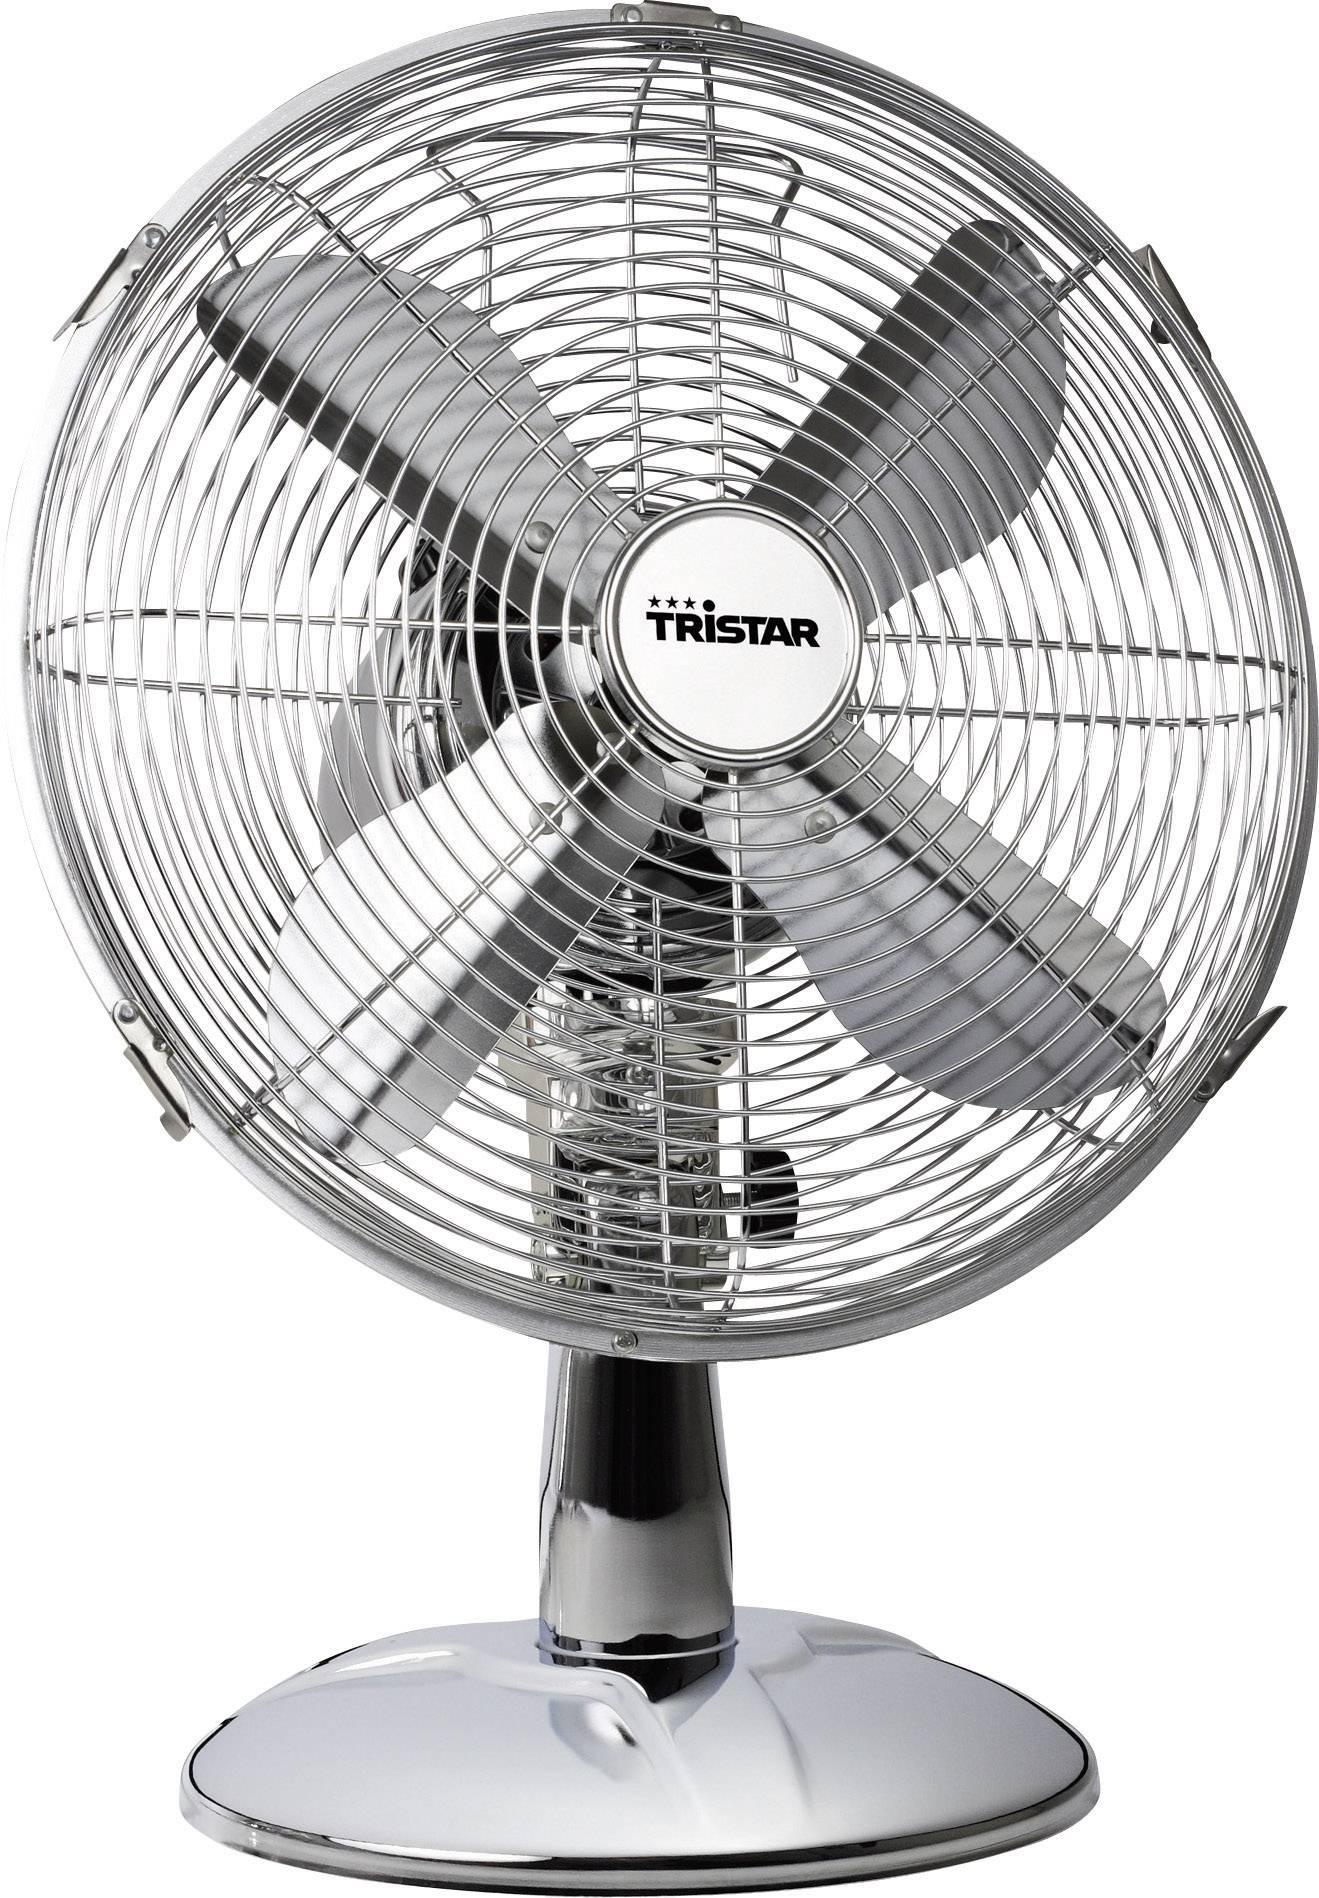 Stolní ventilátor Tristar VE-5953, Ø 30 cm, 45 W, chrom